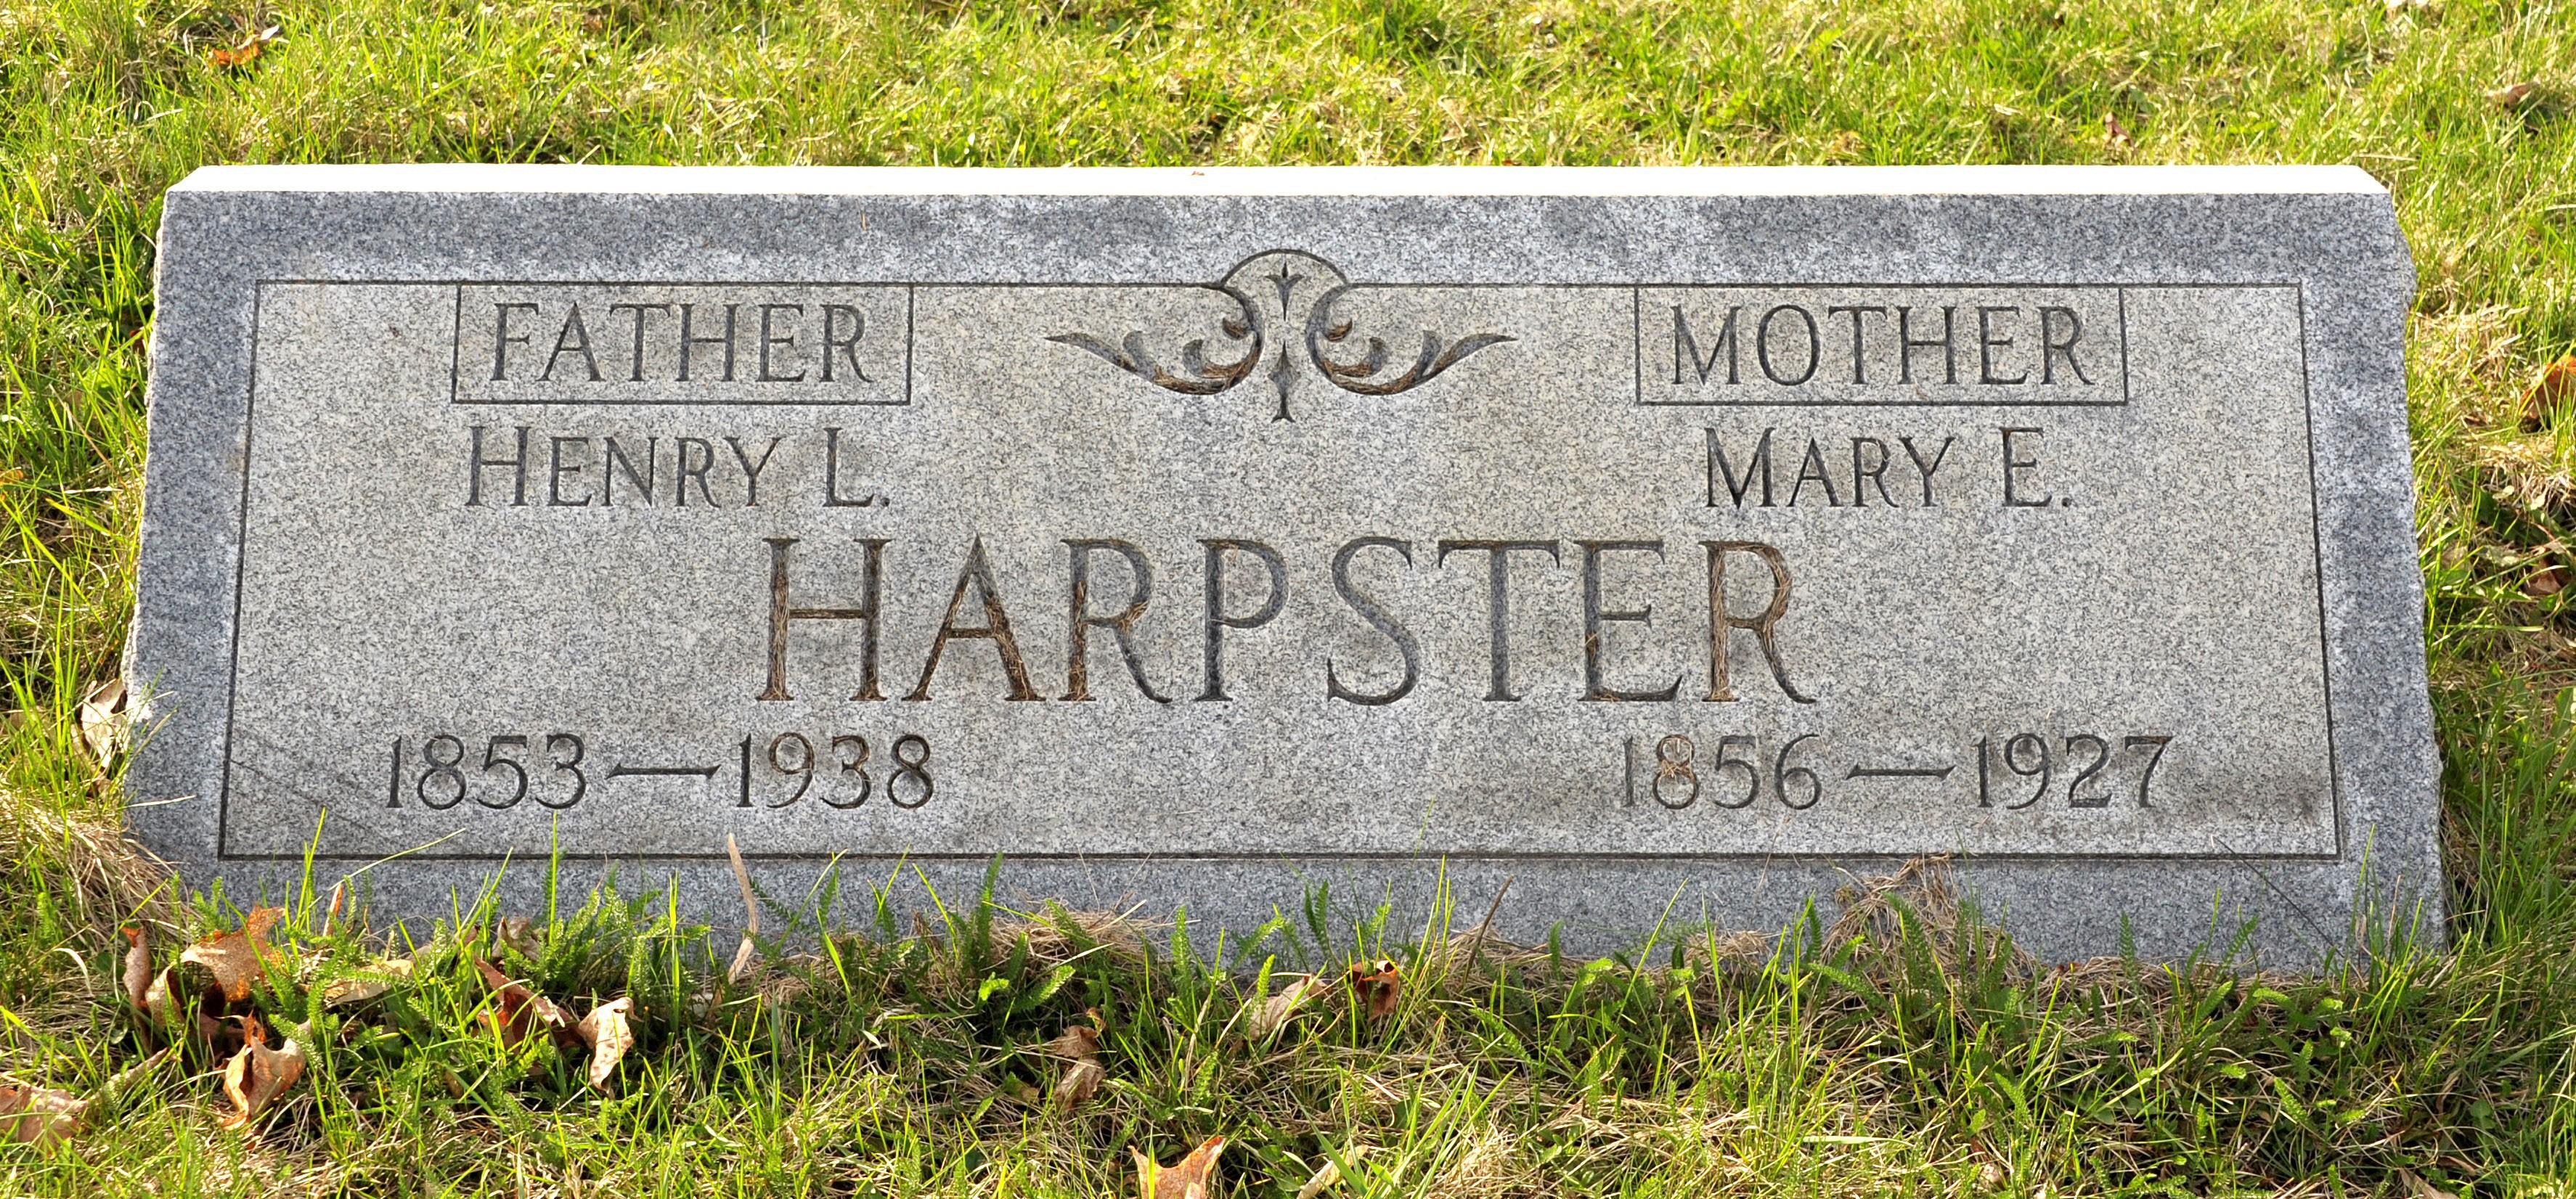 David Frank Harpster